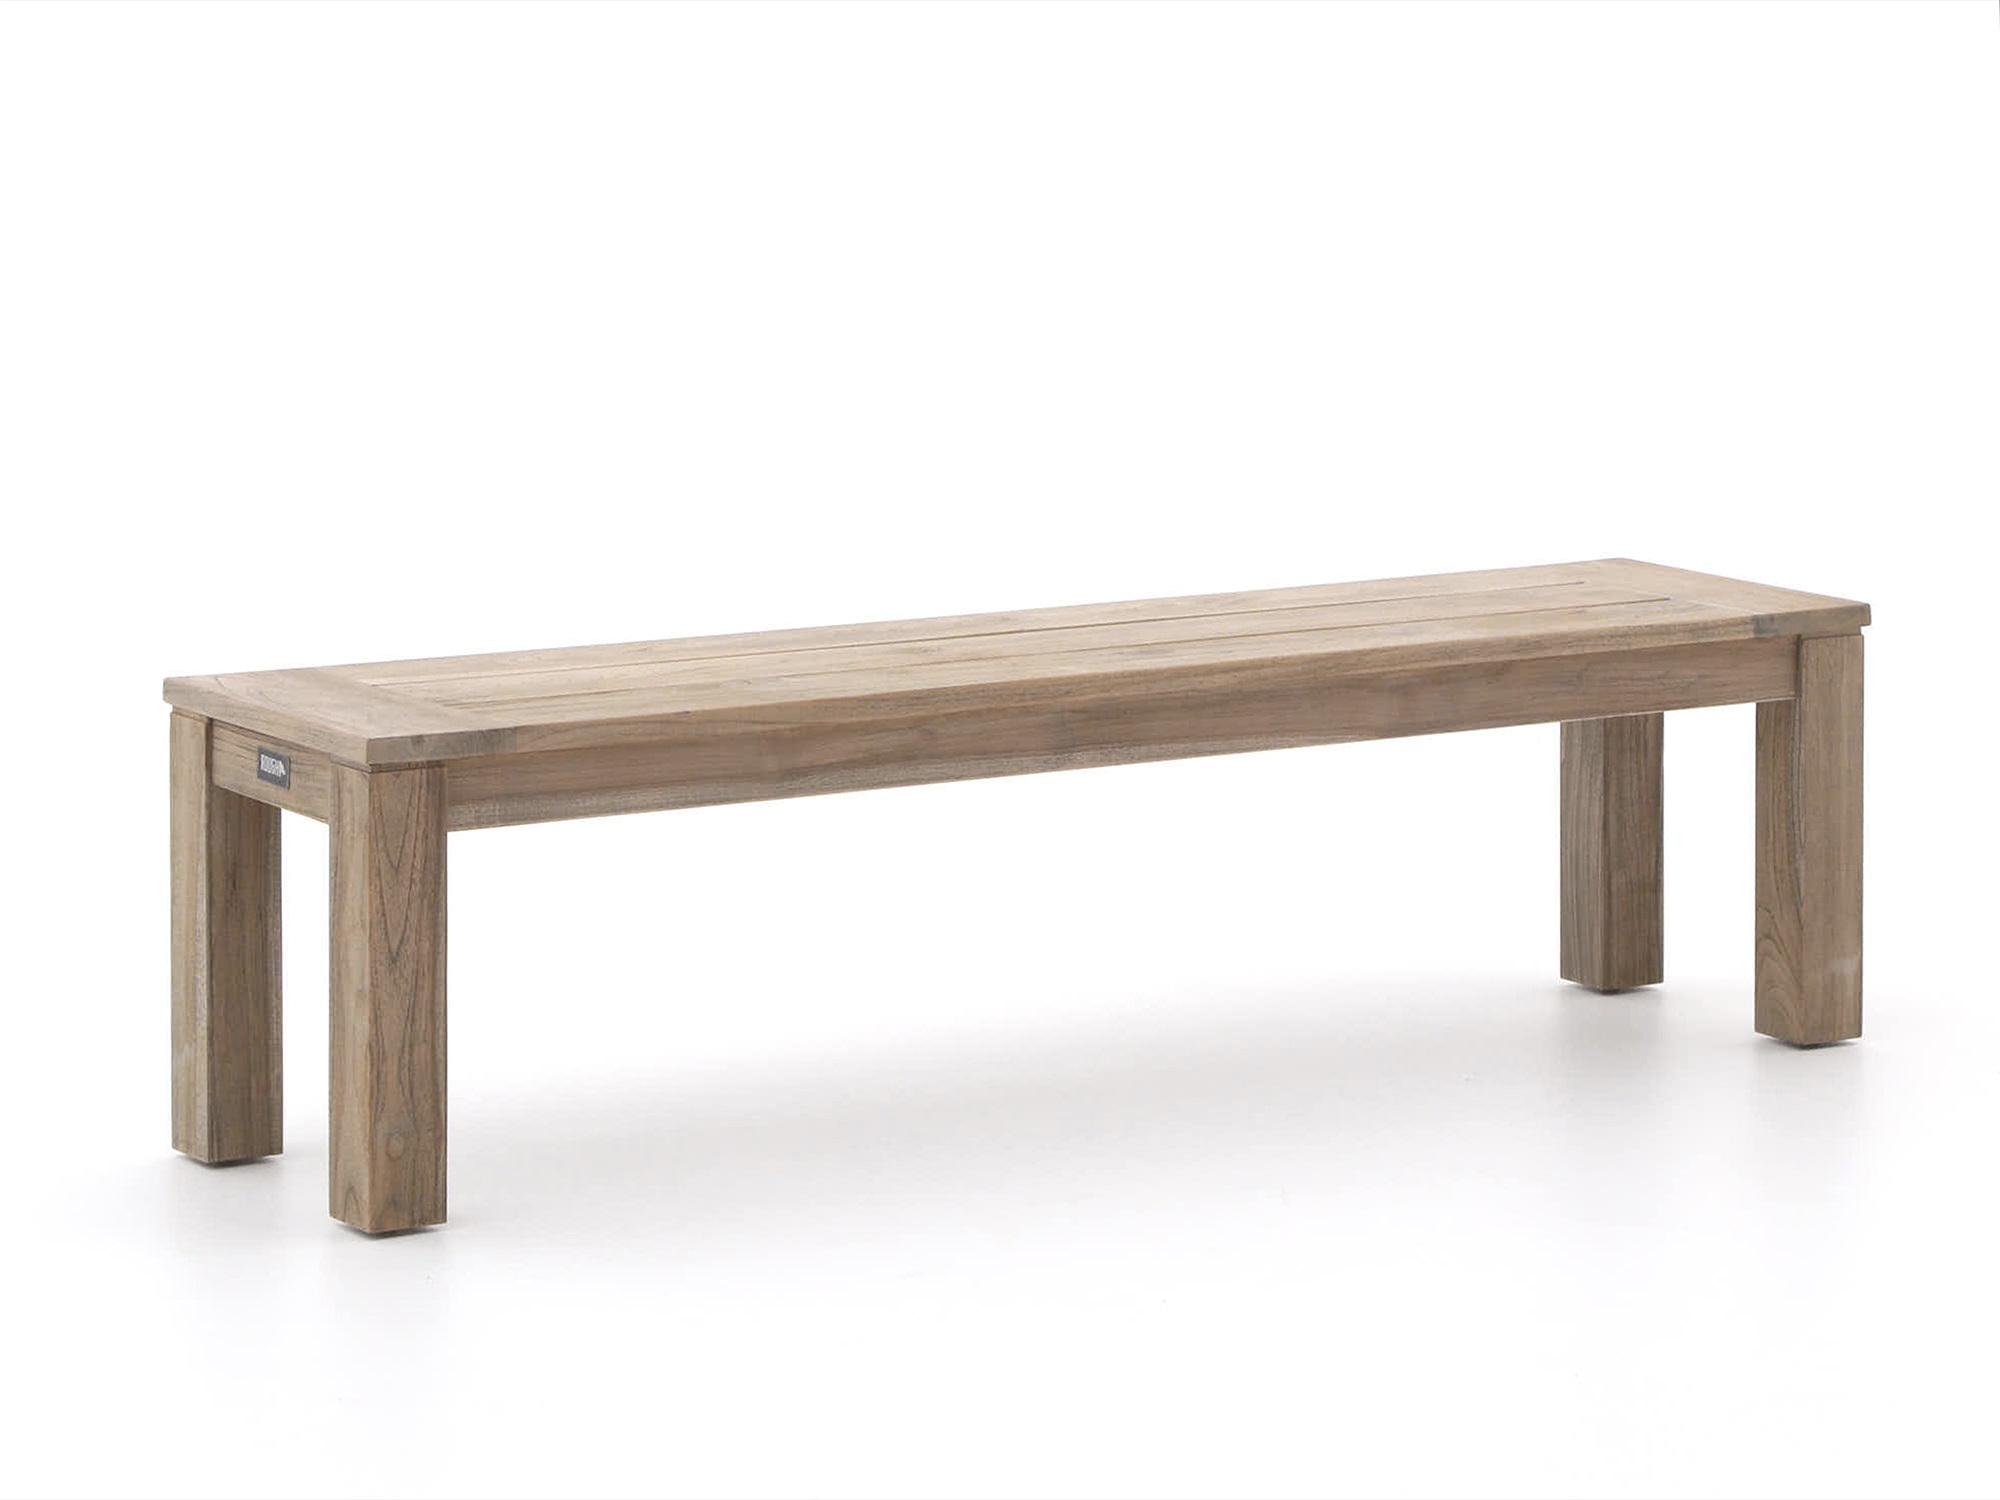 ROUGH-X picknickbank 170x42x45cm - Laagste prijsgarantie!